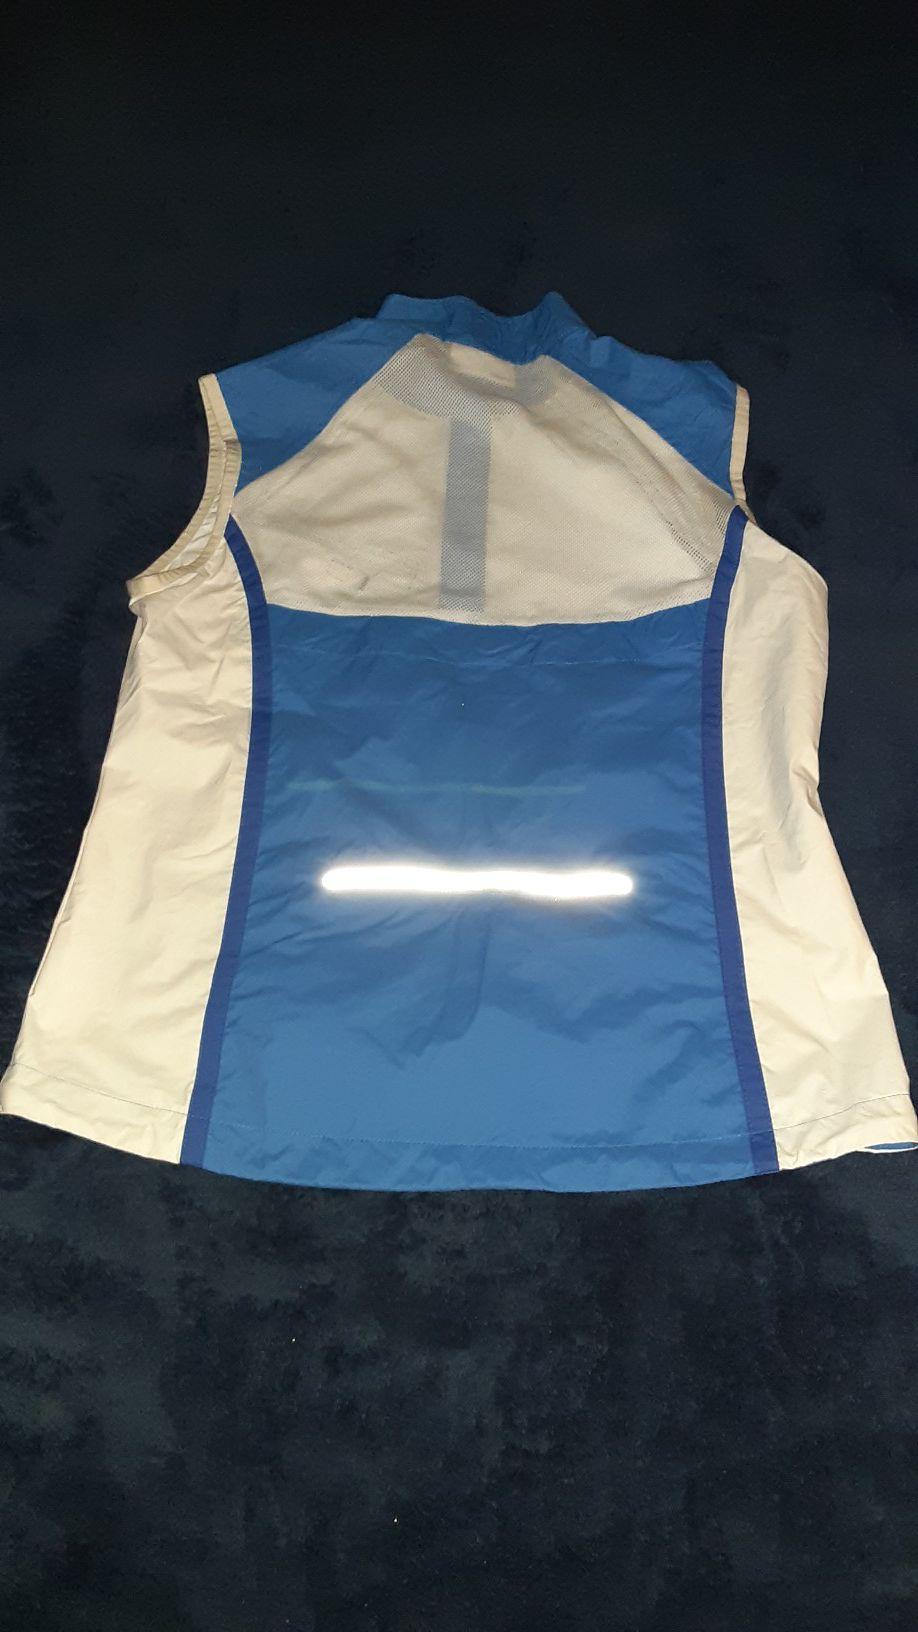 Cannondale Women's Reflectictive Convertible Jacket/Vest size Small